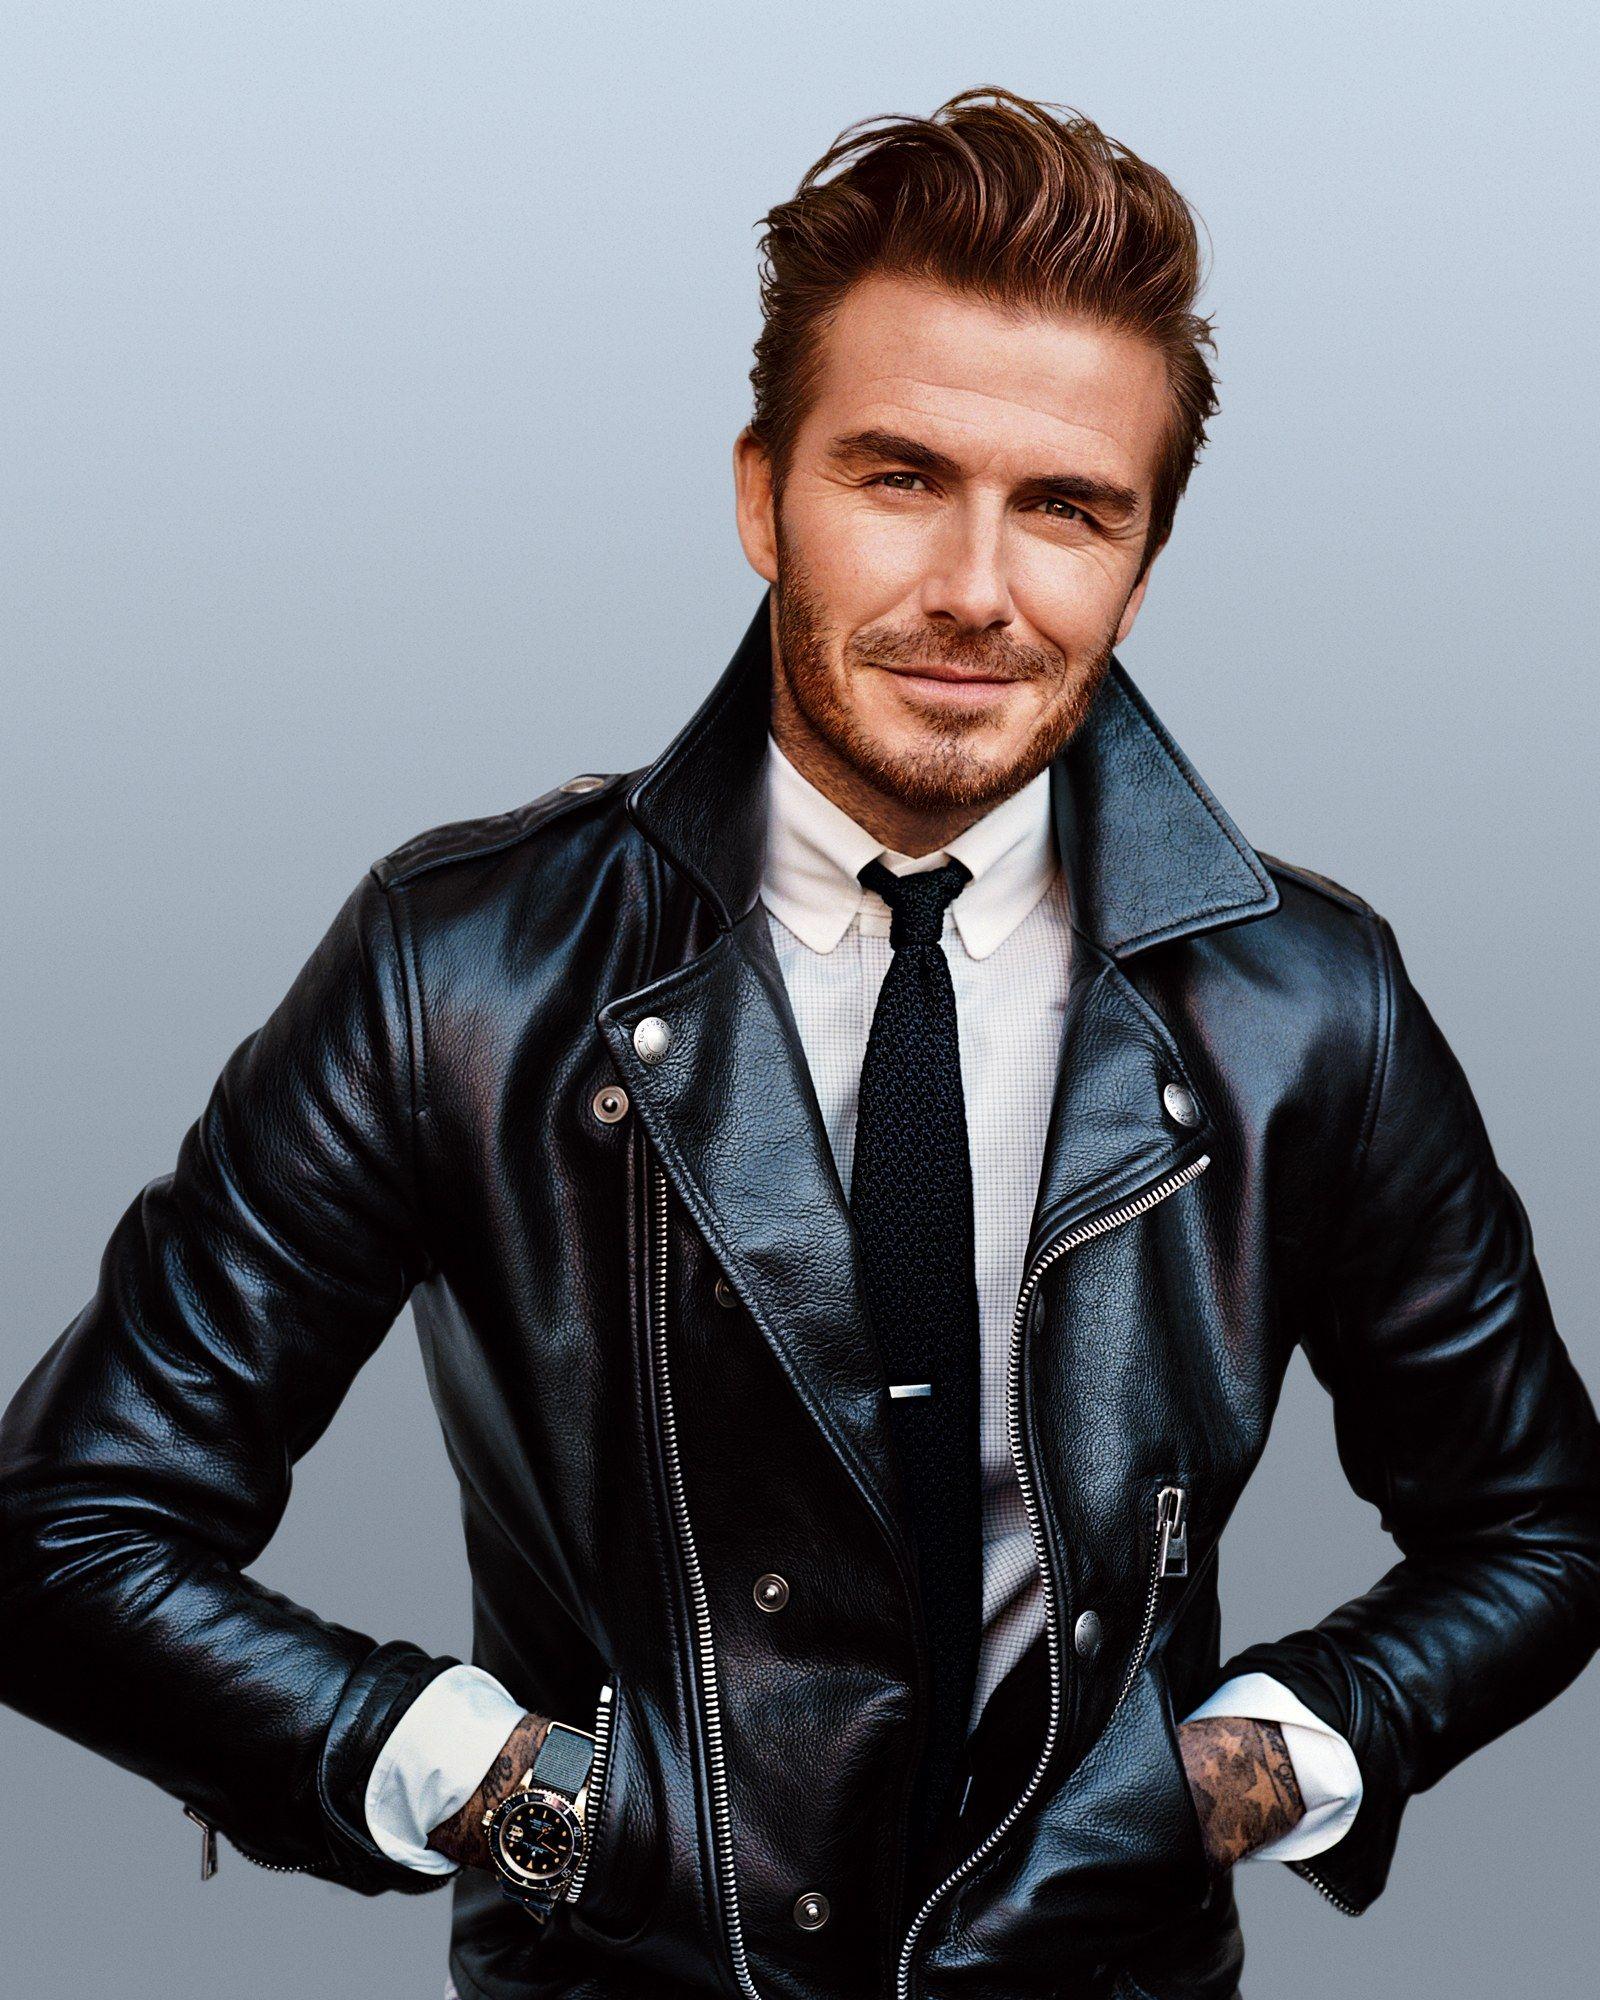 David Beckham para GQ USA Abril 2016 por Alasdair McLellan